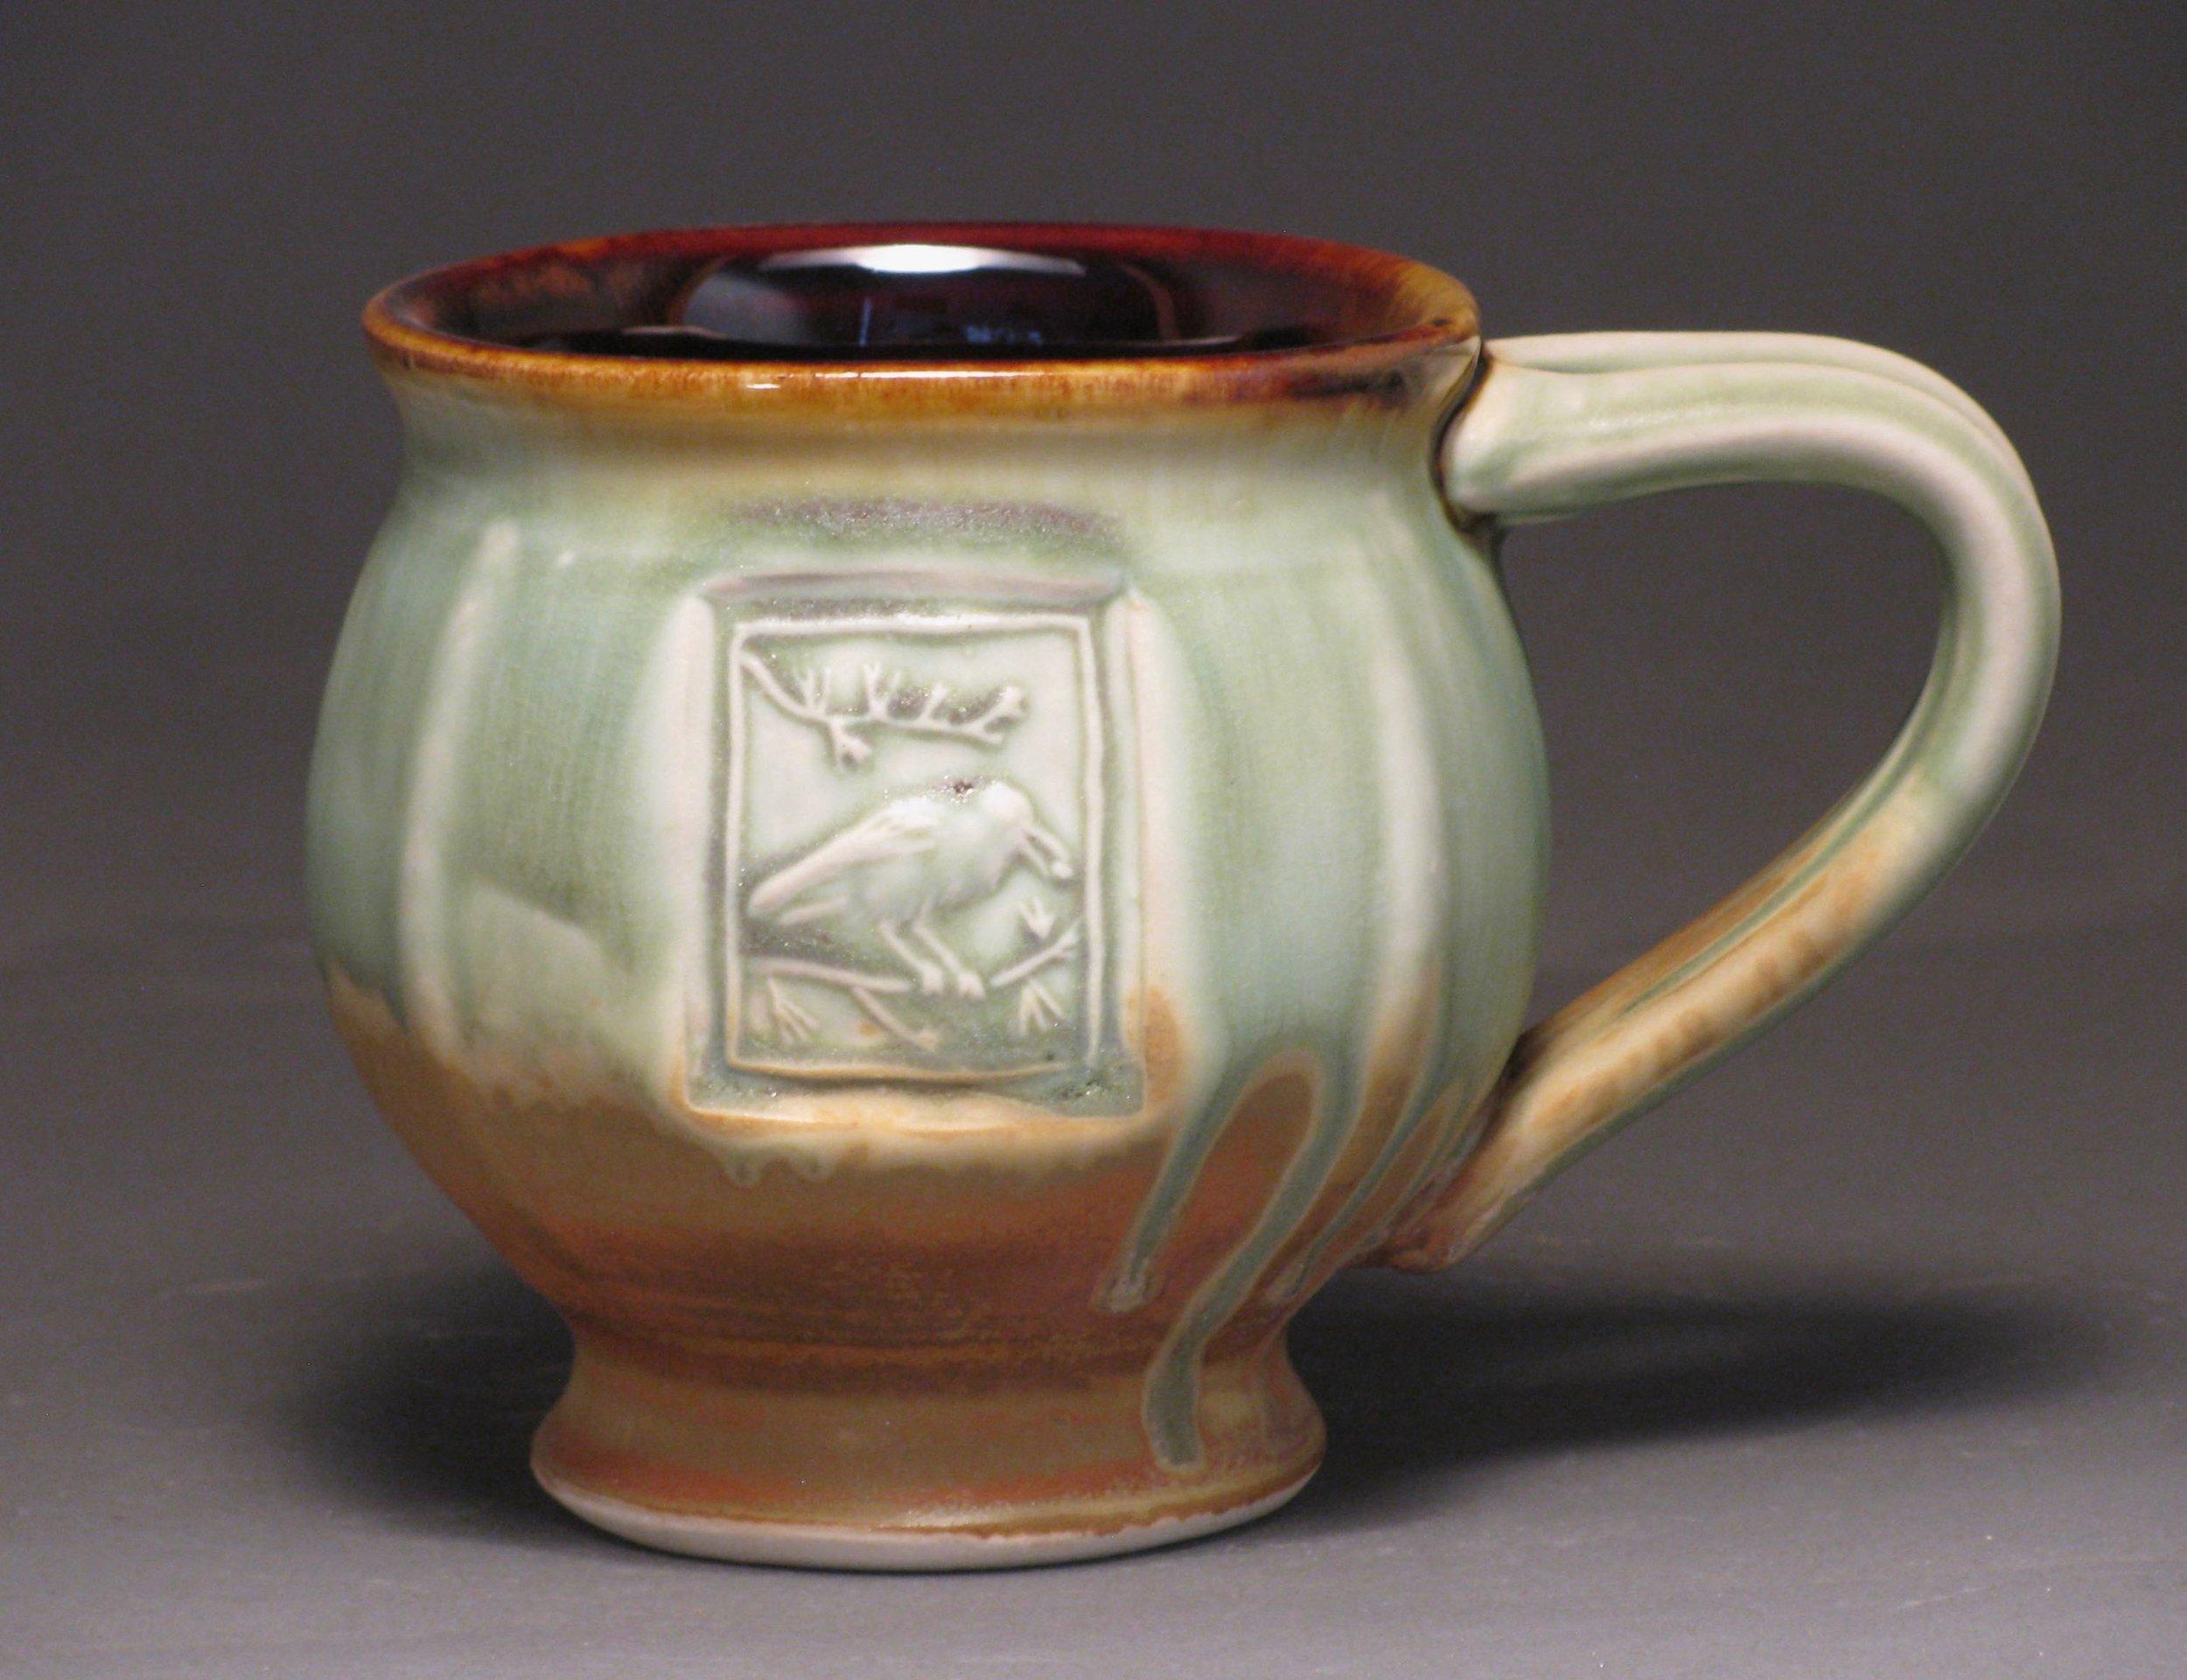 Mug with Clark's nutcracker